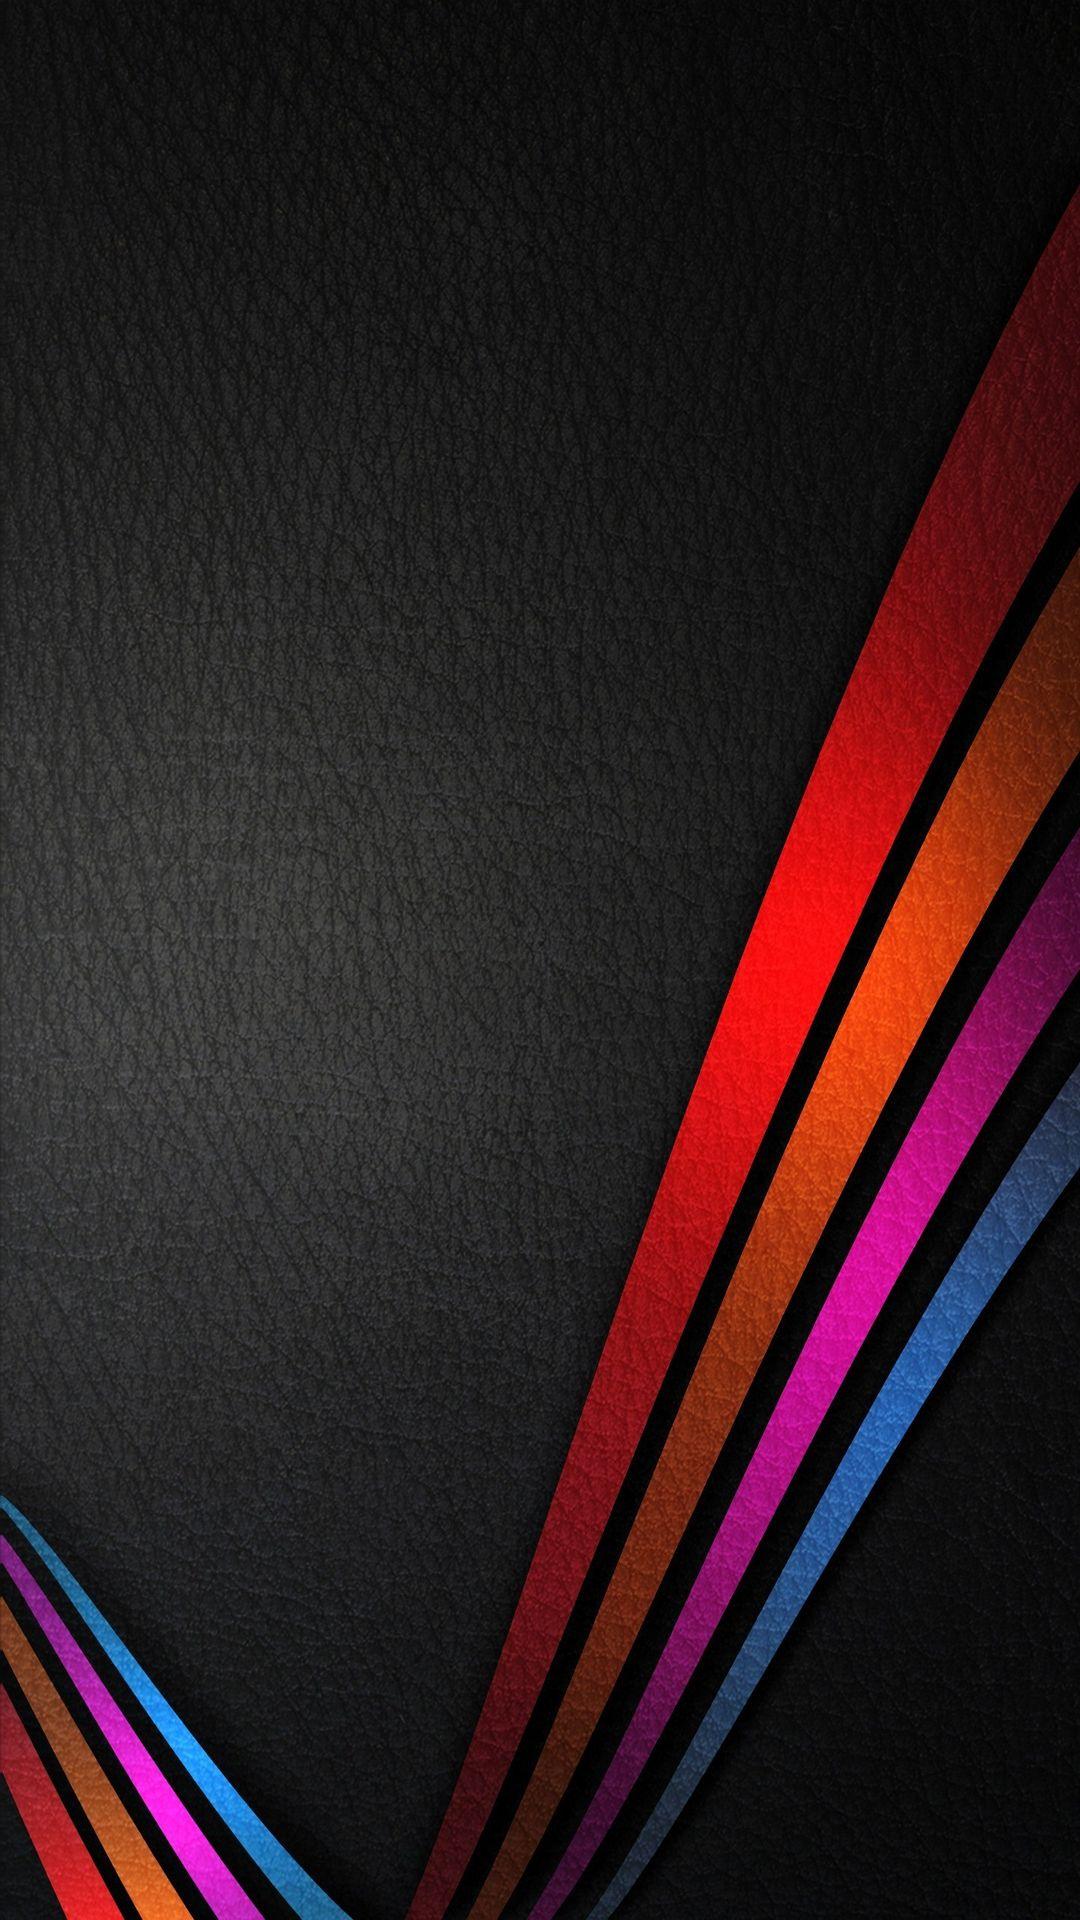 Most Inspiring Wallpaper Horse Iphone 5s - 820ab98aeb8cad9d13ba622d10f967aa  Gallery_419392.jpg